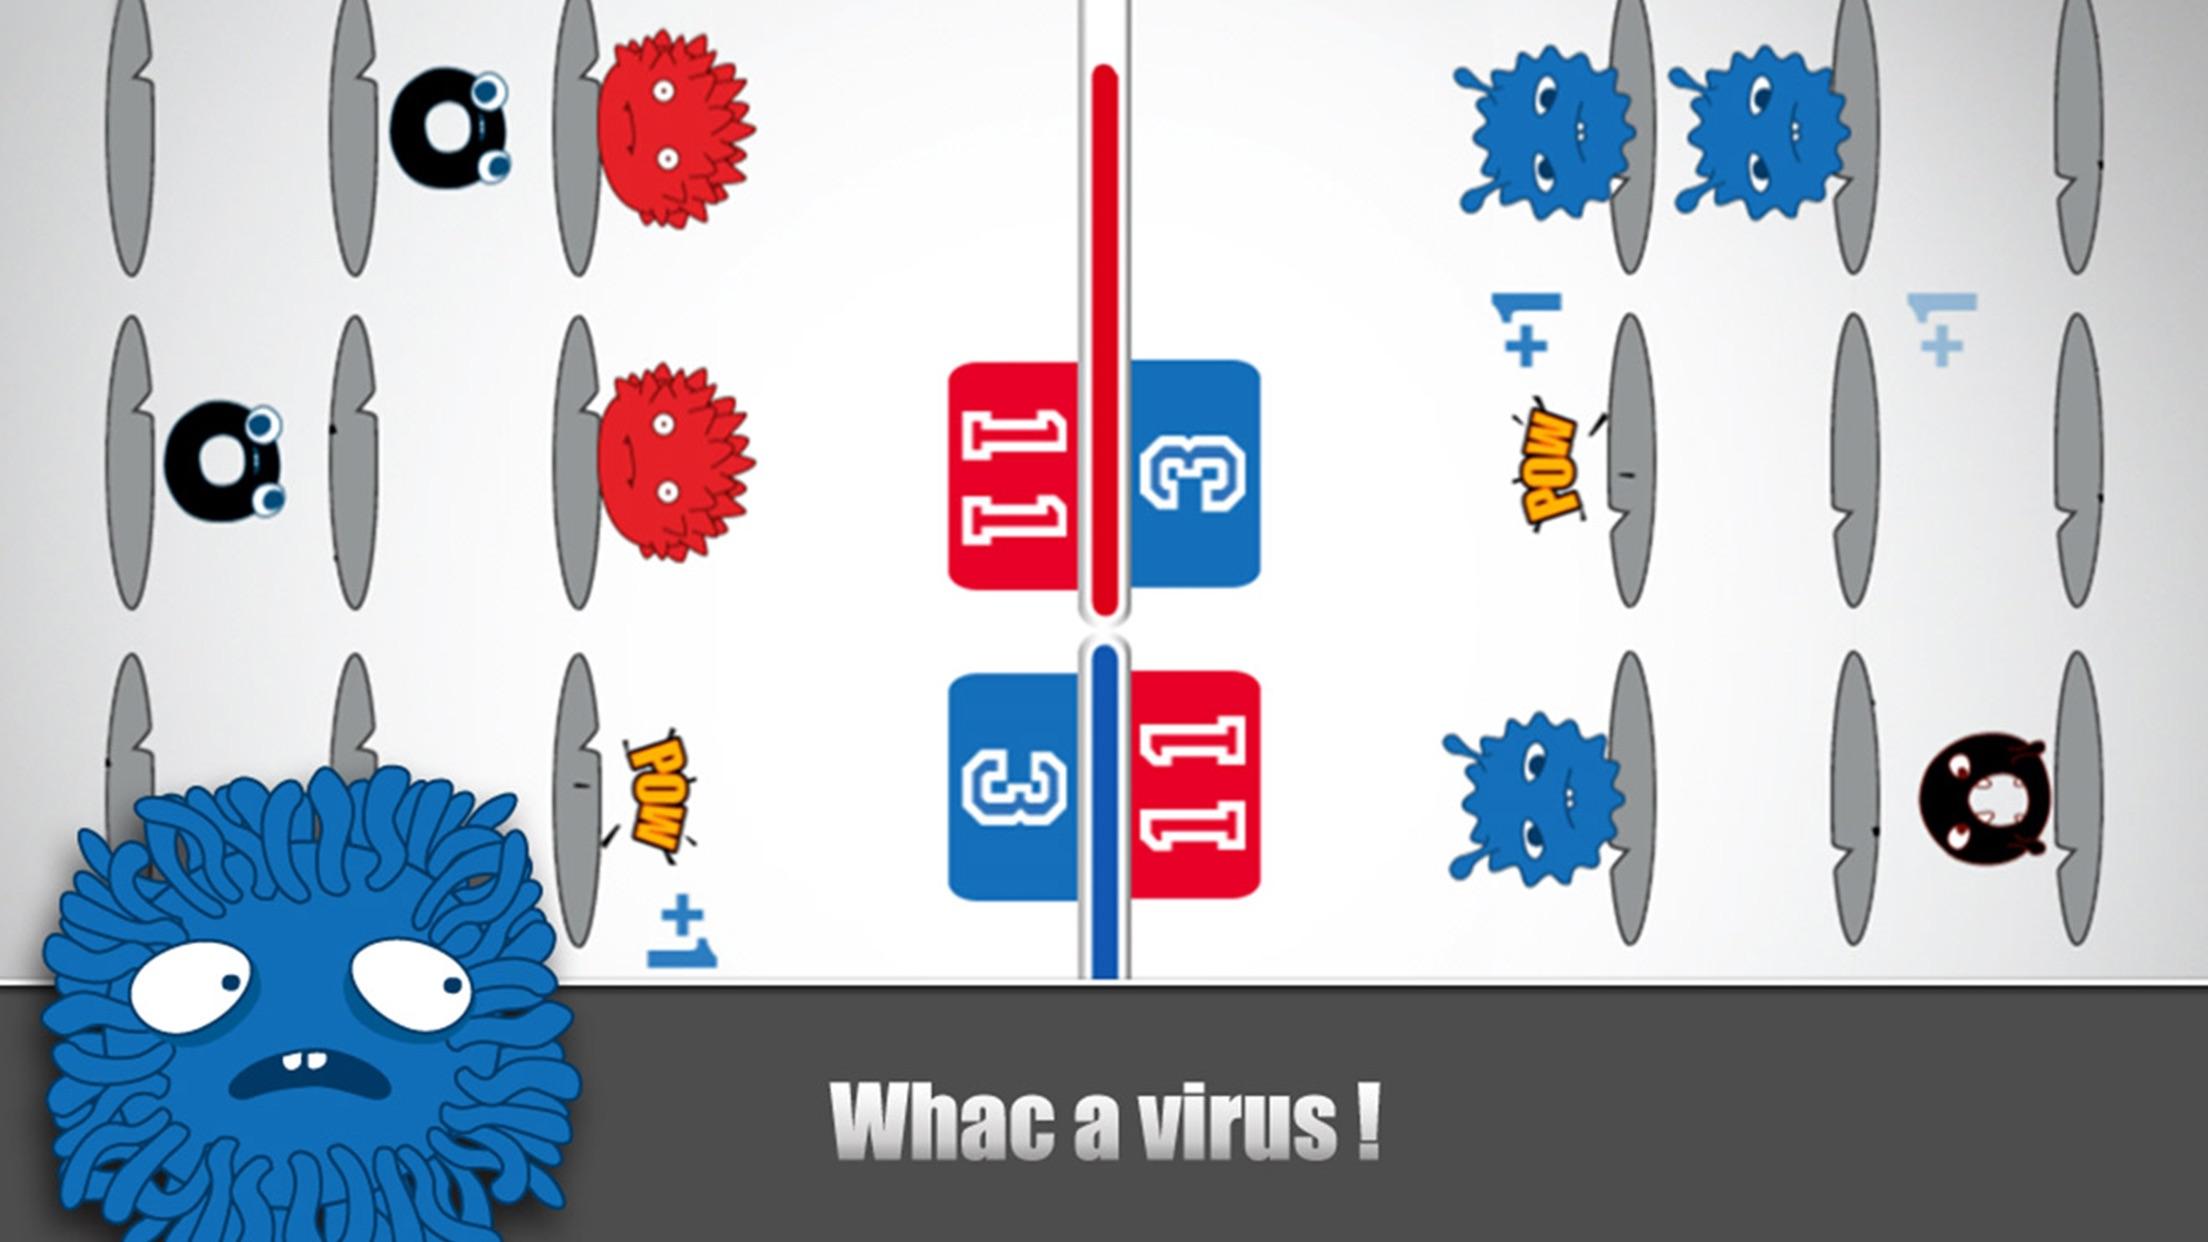 Virus Vs. Virus Delux (multiplayer versus game collection) Screenshot